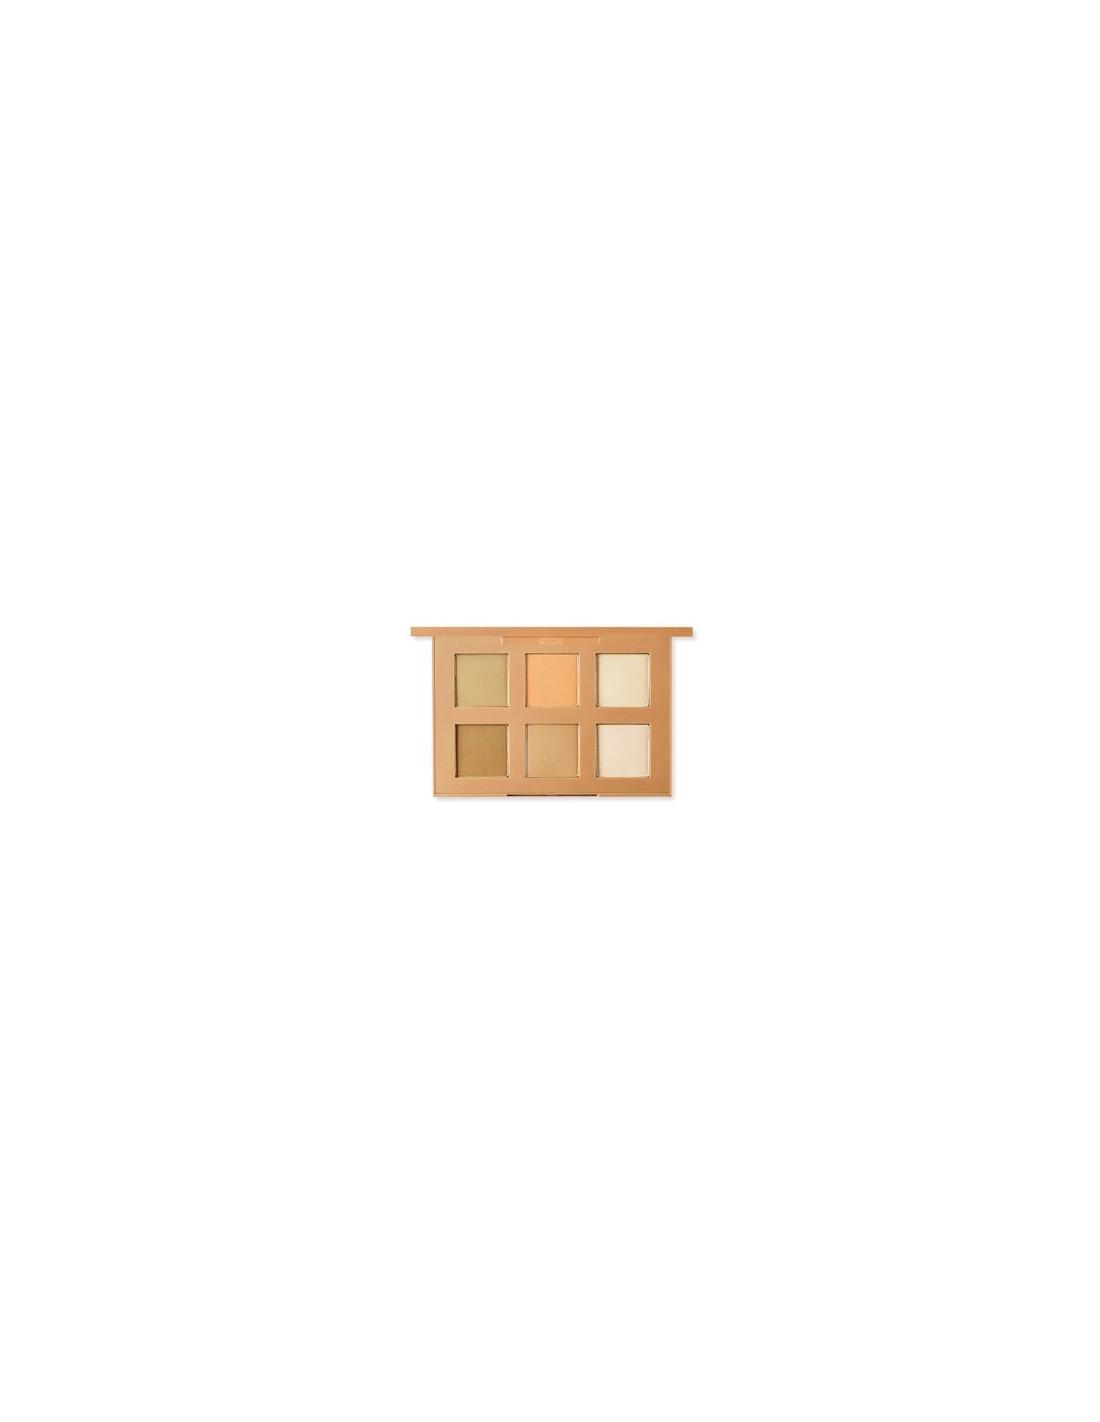 etude house personal color palette review